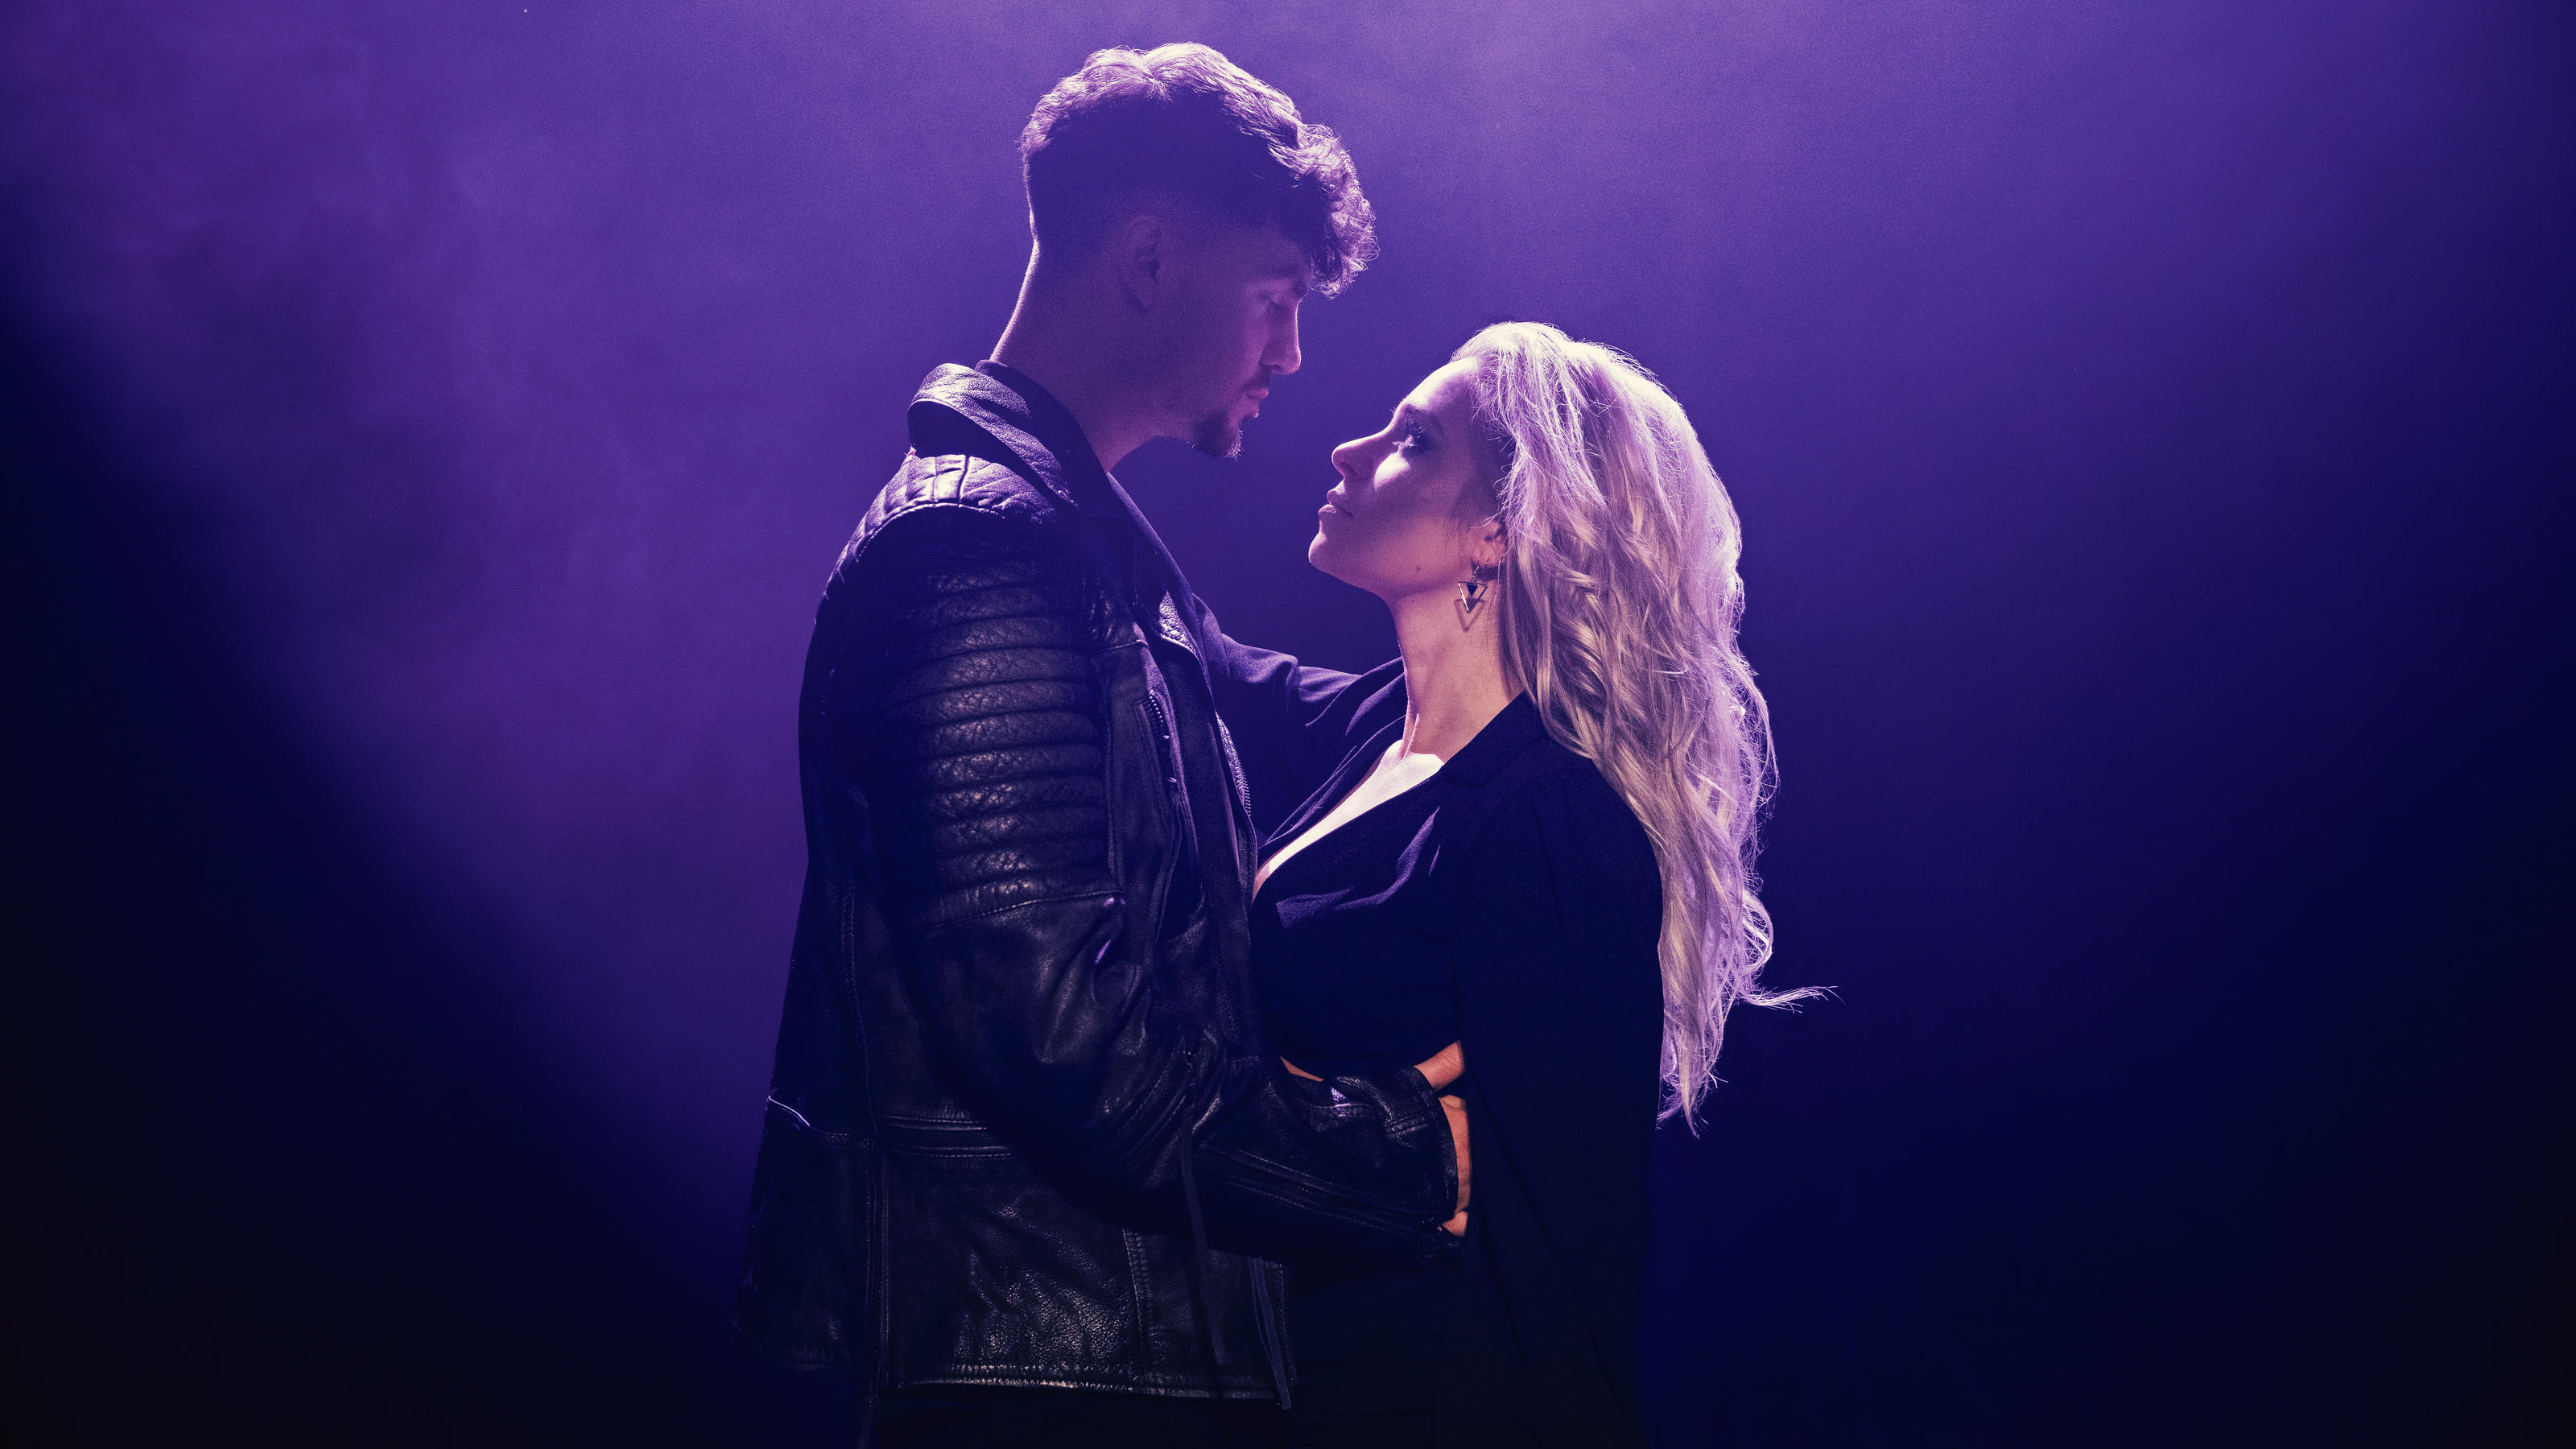 Ex-Boyband-Sänger Karsten Walter liebt Schlagerstar Marina Marx - VIP.de, Star News